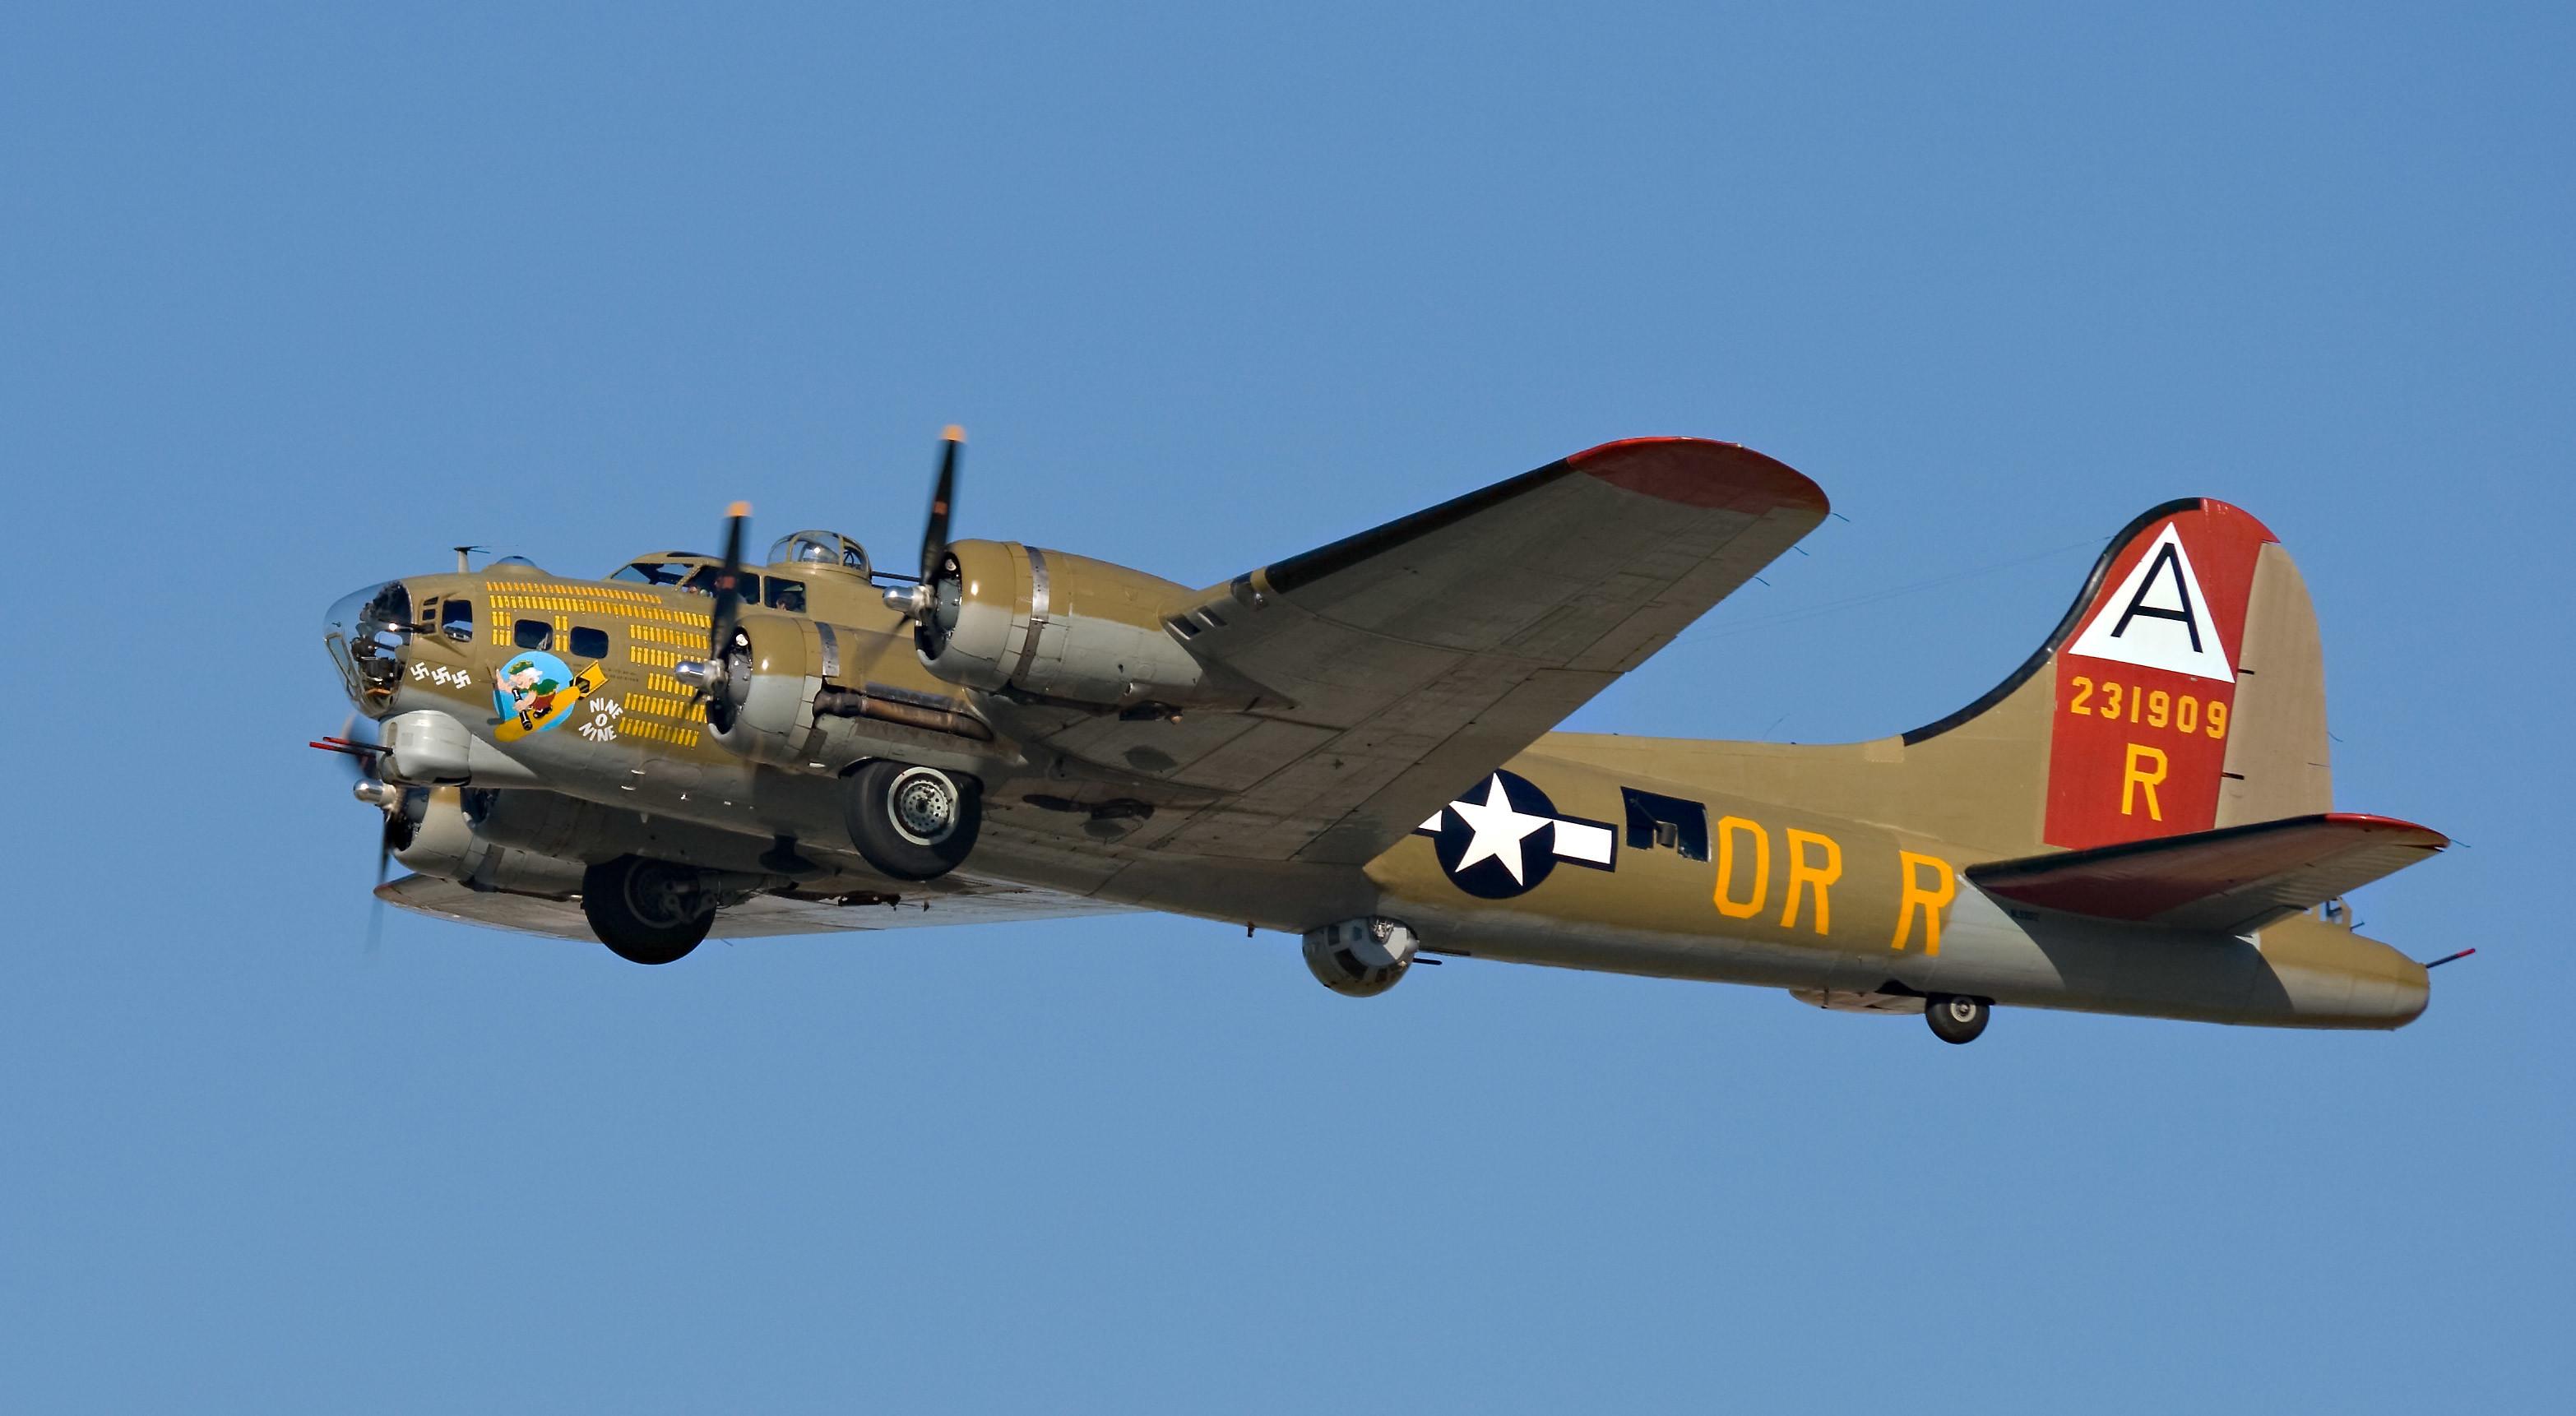 B 17 Flying Fortress Wallpaper – WallpaperSafari